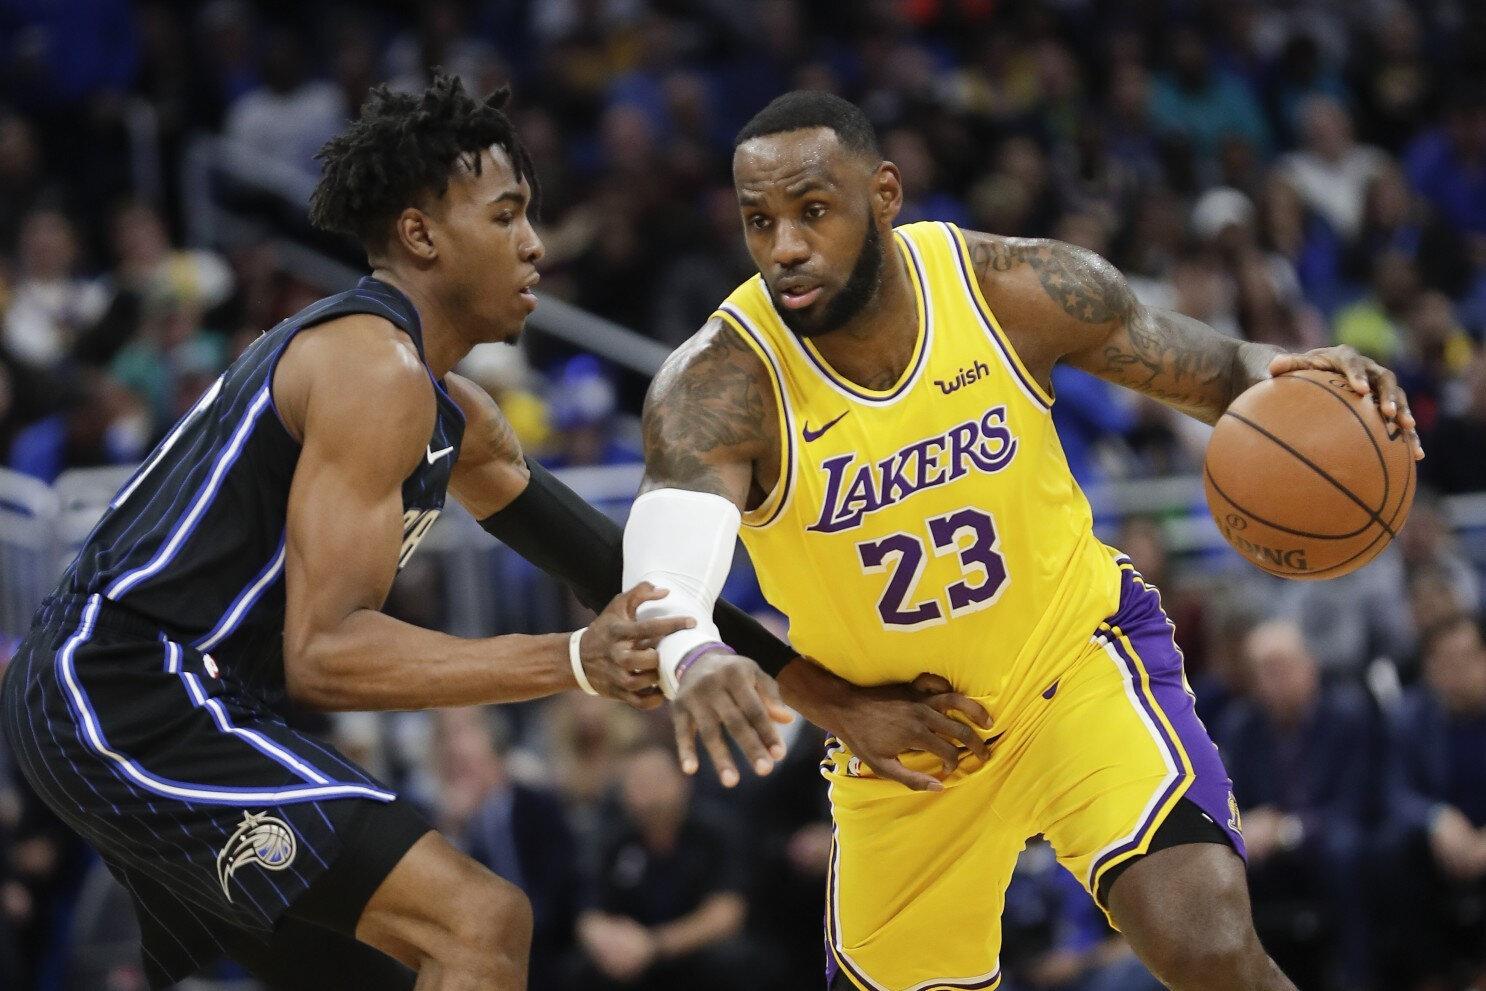 Los Angeles Lakers bu sezon 22. galibiyetini elde etti.